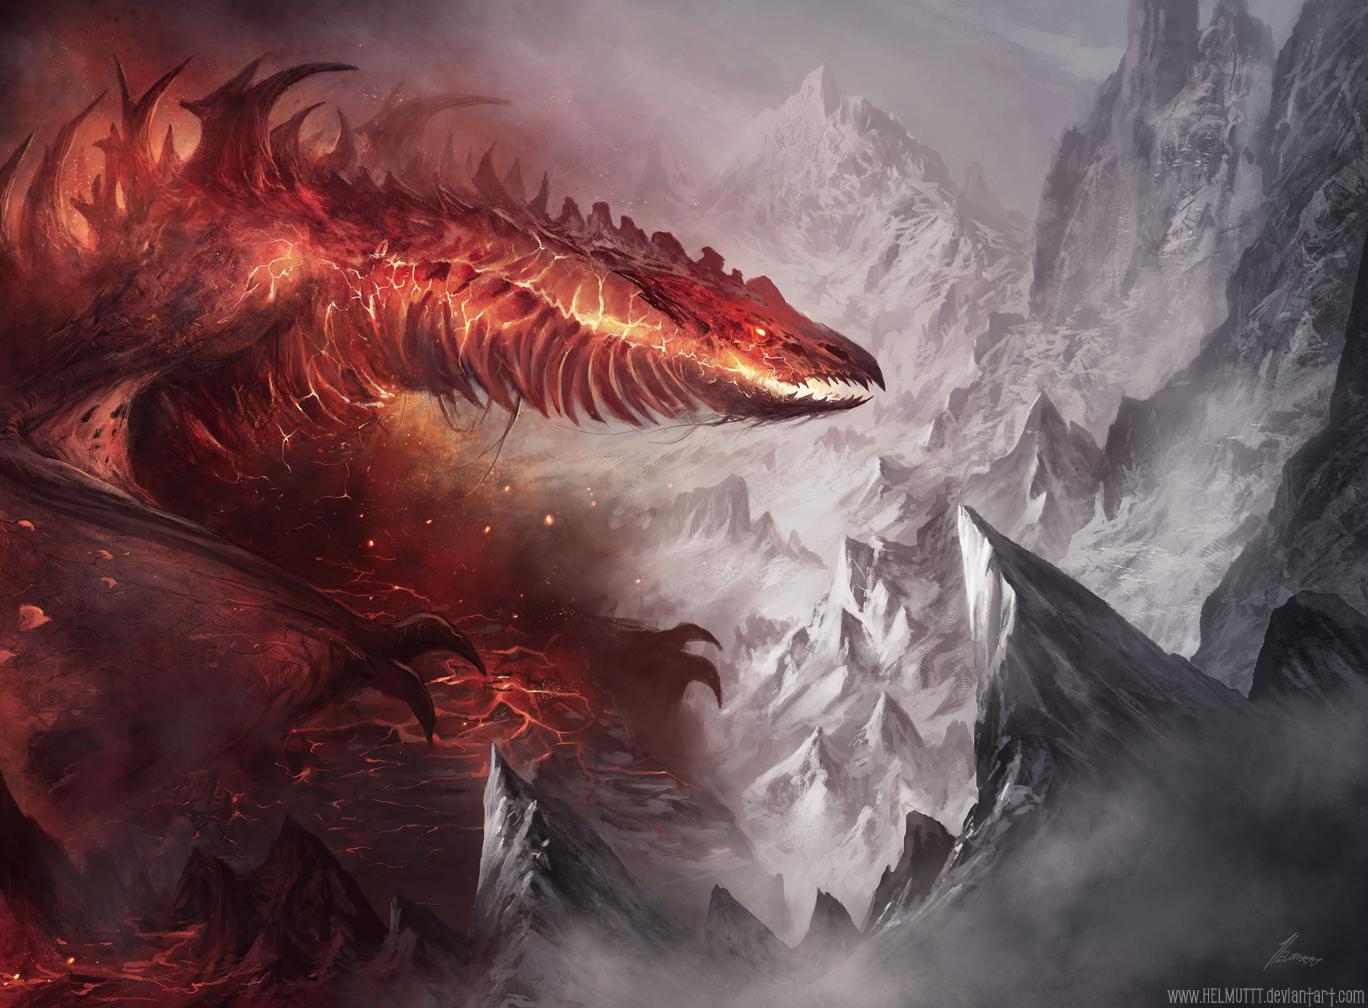 Epic dragon wallpaper dump - Album on Imgur